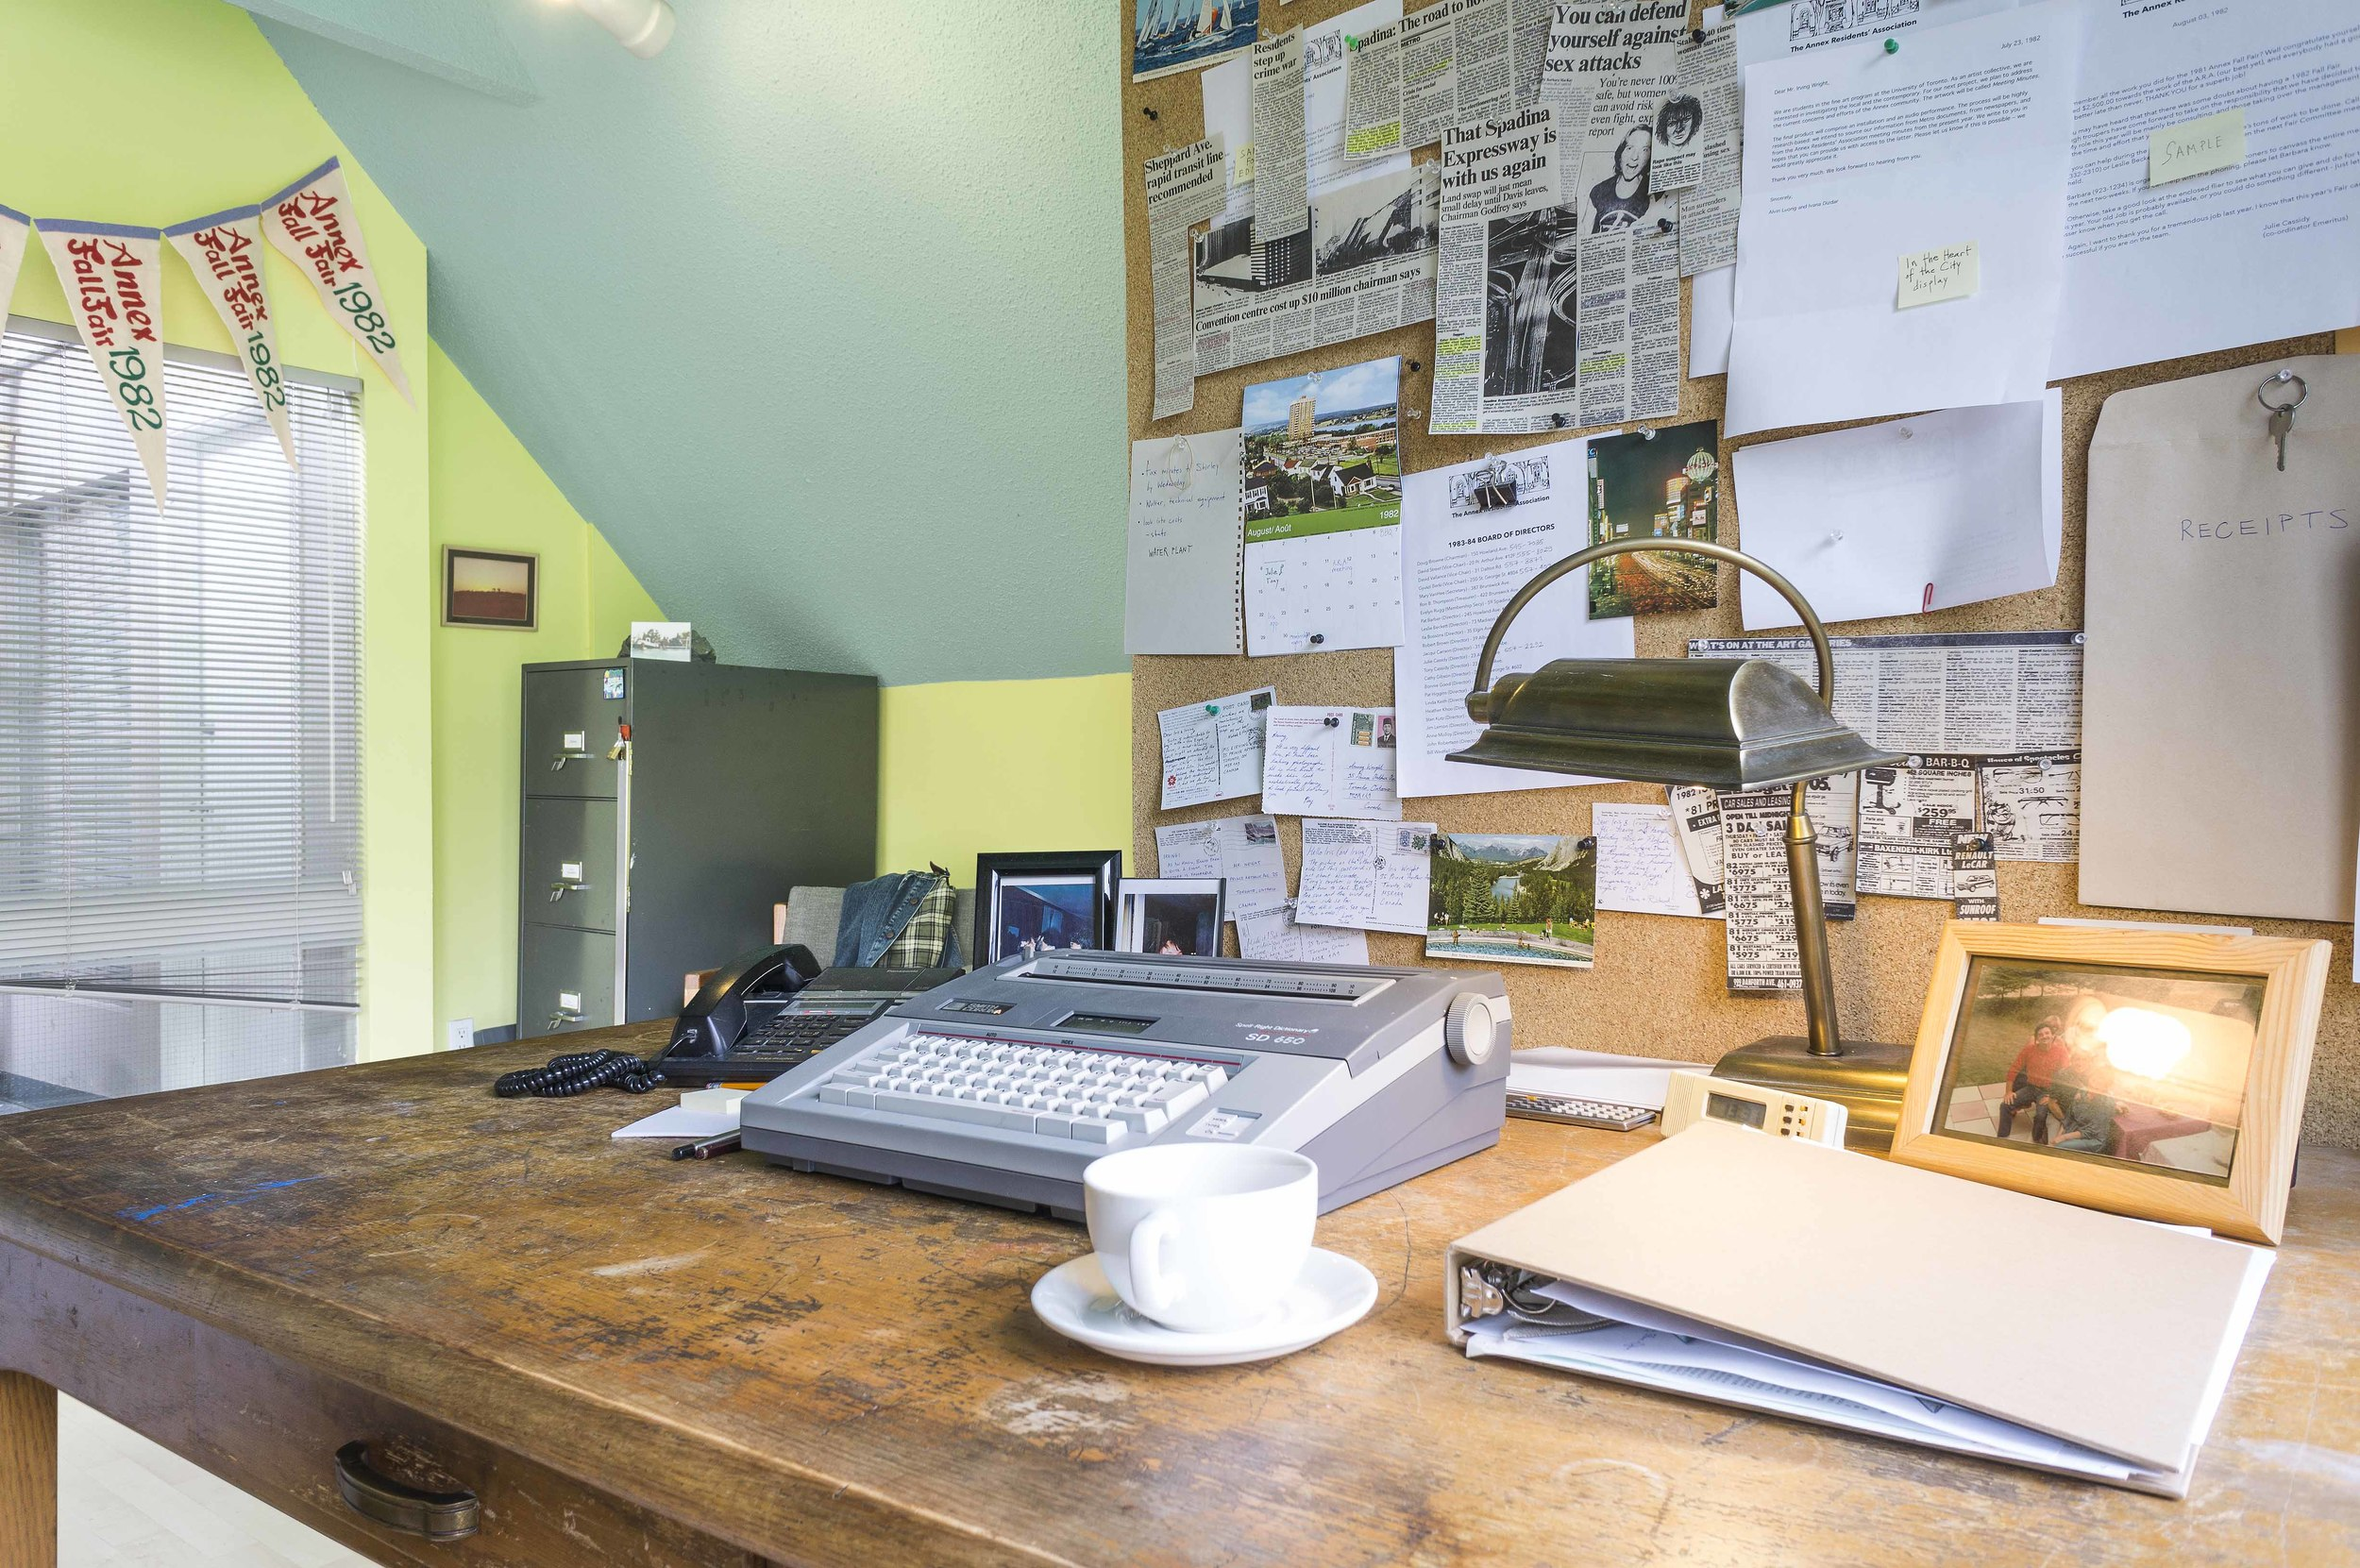 Meeting Minutes - Composite Materials - E-2.jpg